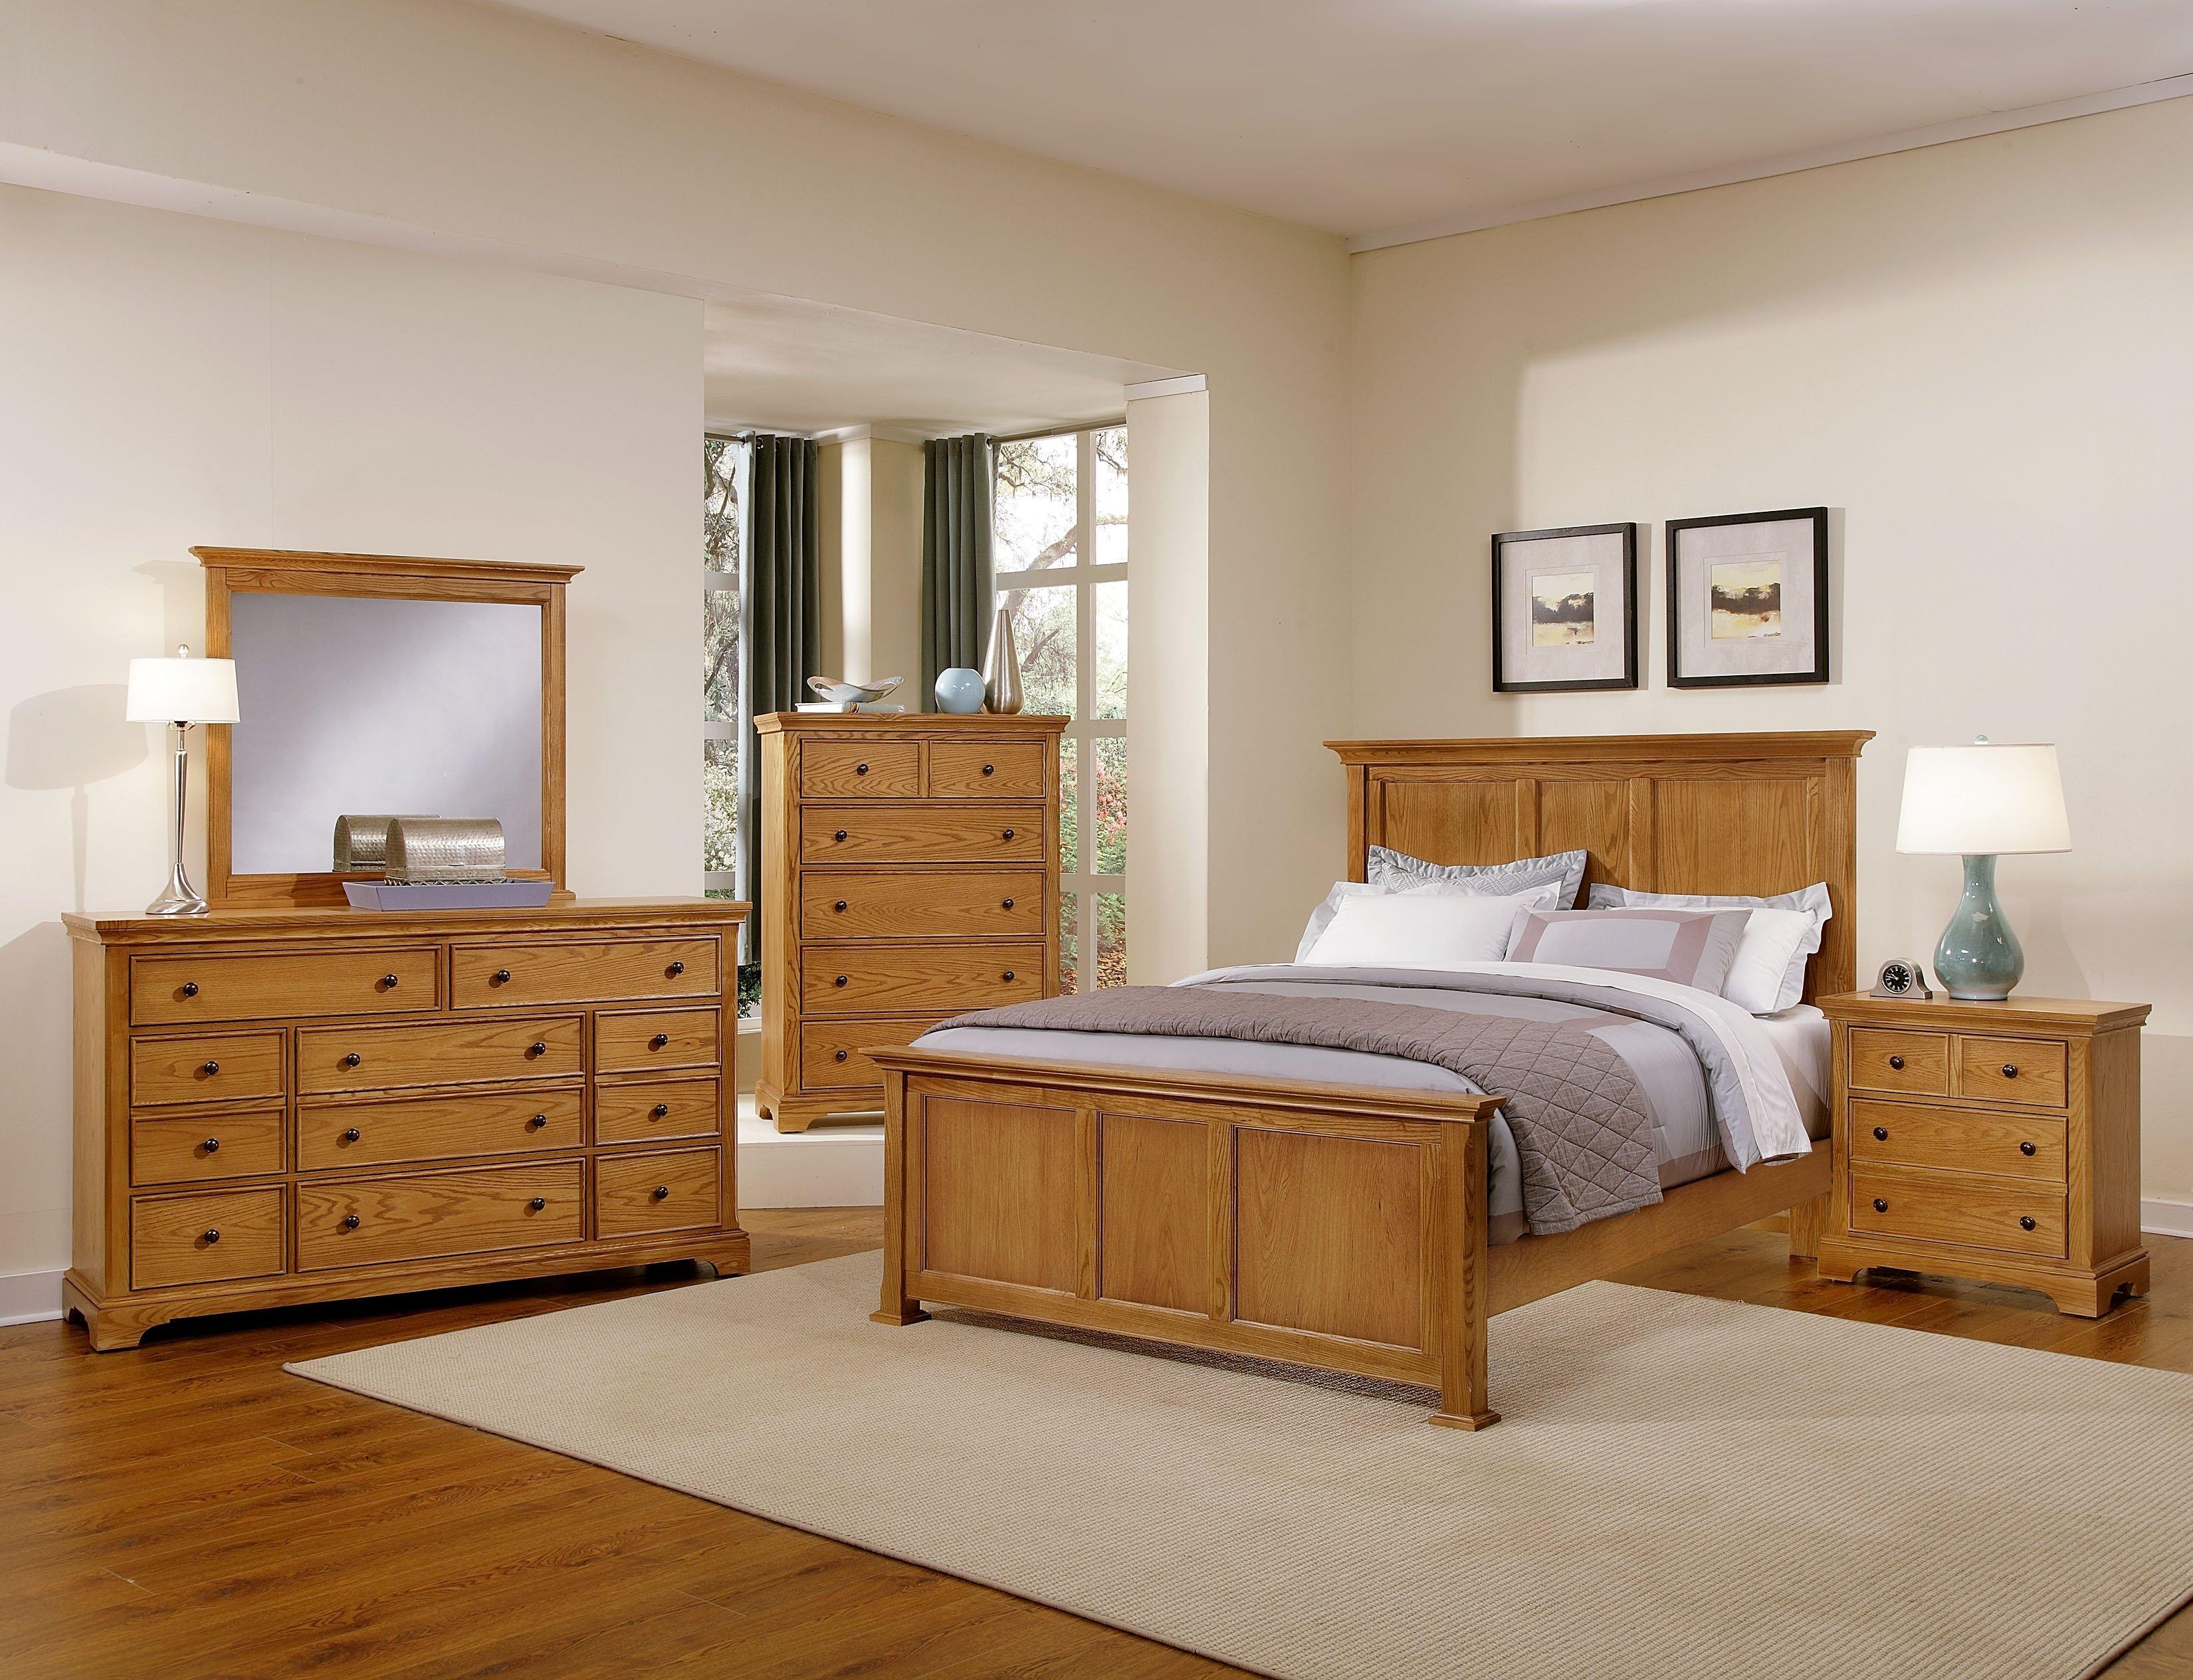 Vaughan Bassett Forsyth King Bedroom Group - Item Number: BB75 K Bedroom Group 2